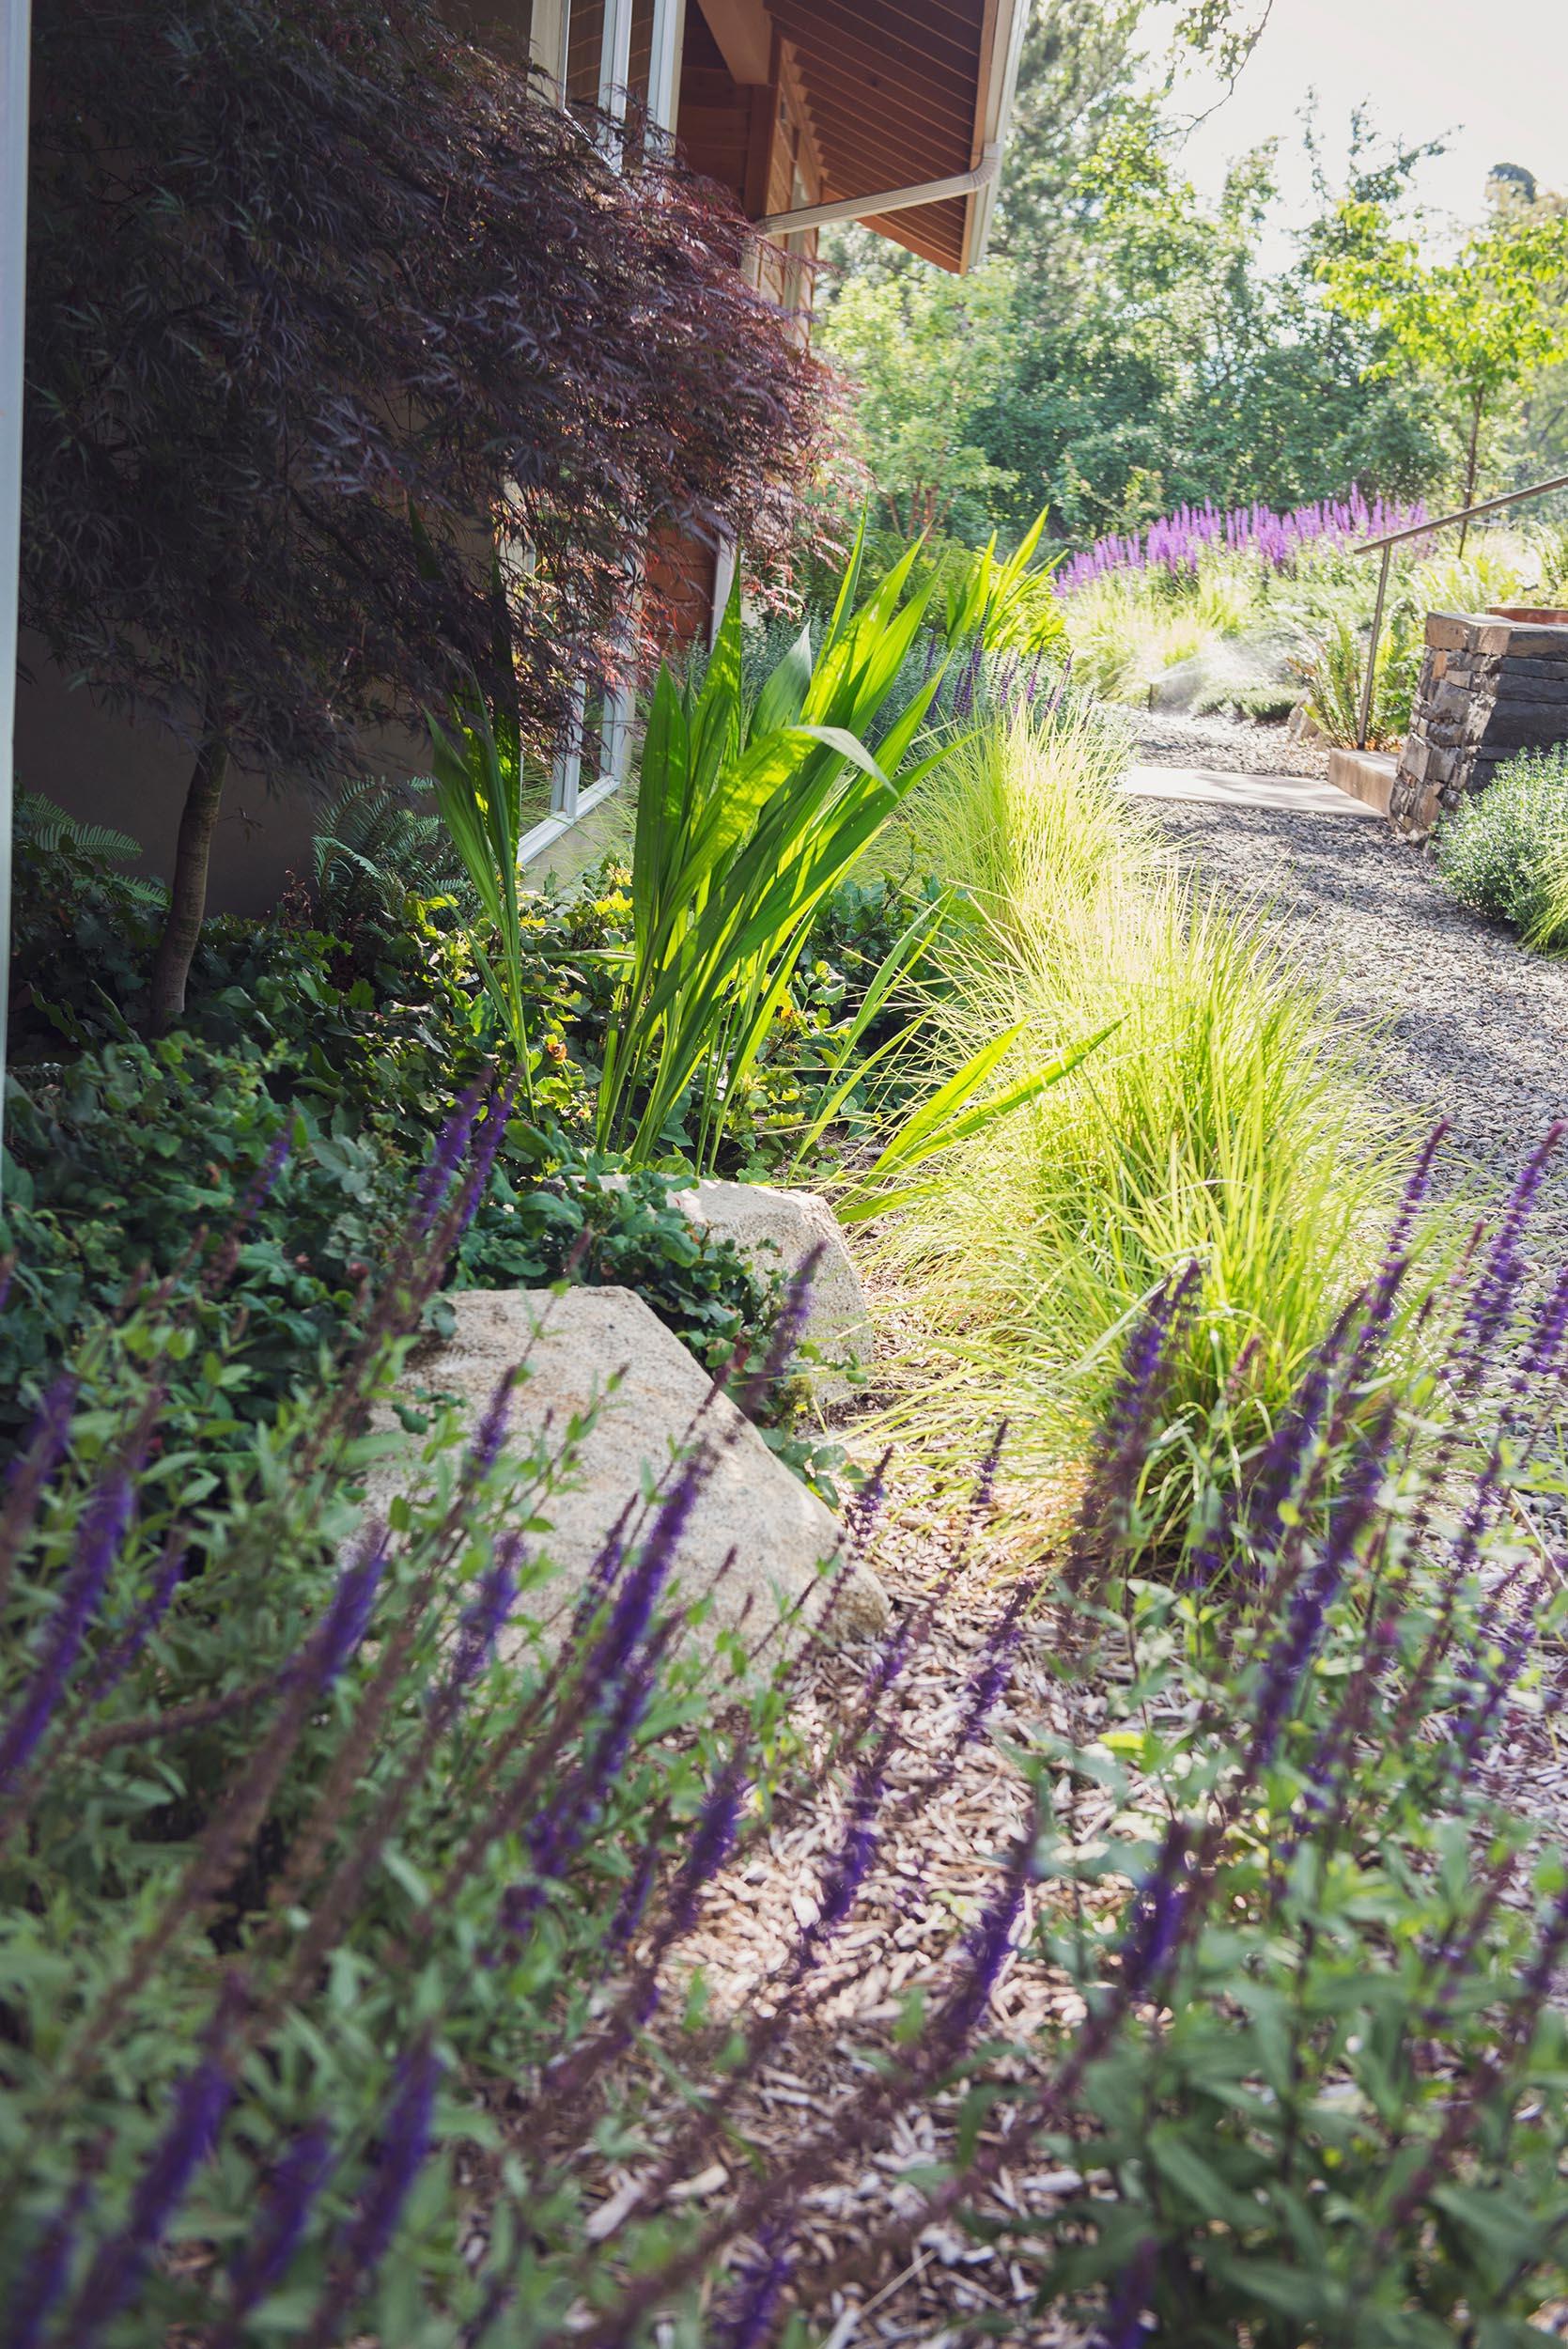 meadow salvia + bunch grasses +crocosmia + autumn moore grass +  perennial garden + japanese maple + crushed basalt path + stacked basalt locally qu